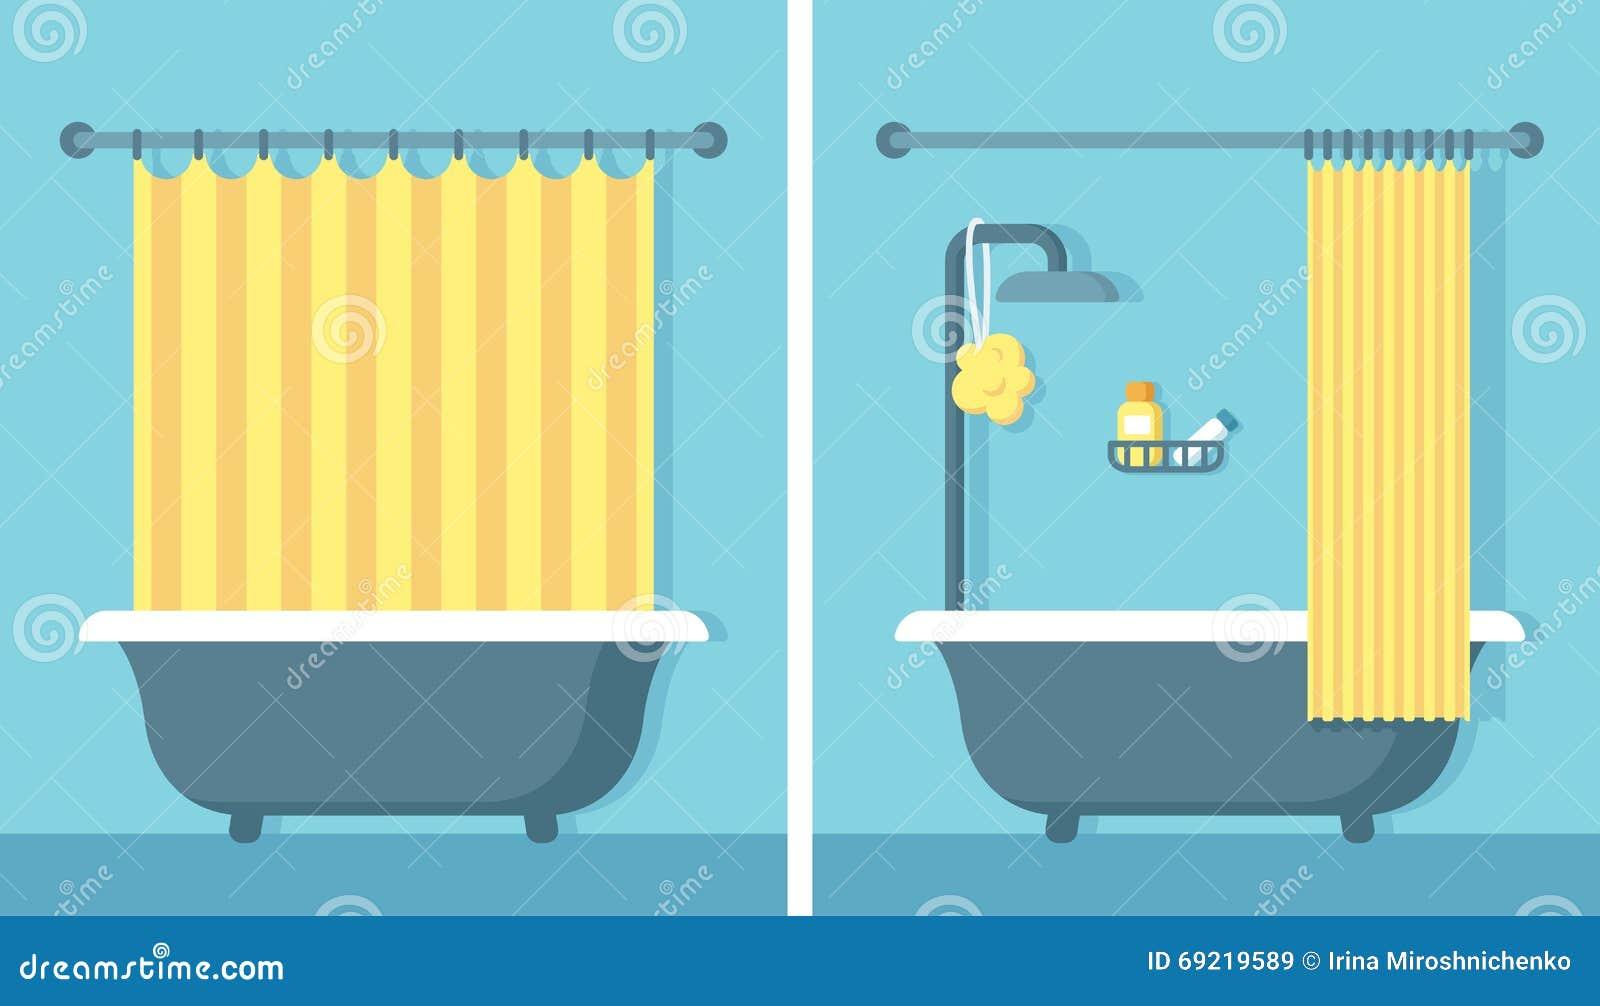 Bathroom Designers Flat Bathroom Interior Stock Vector Image 69219589